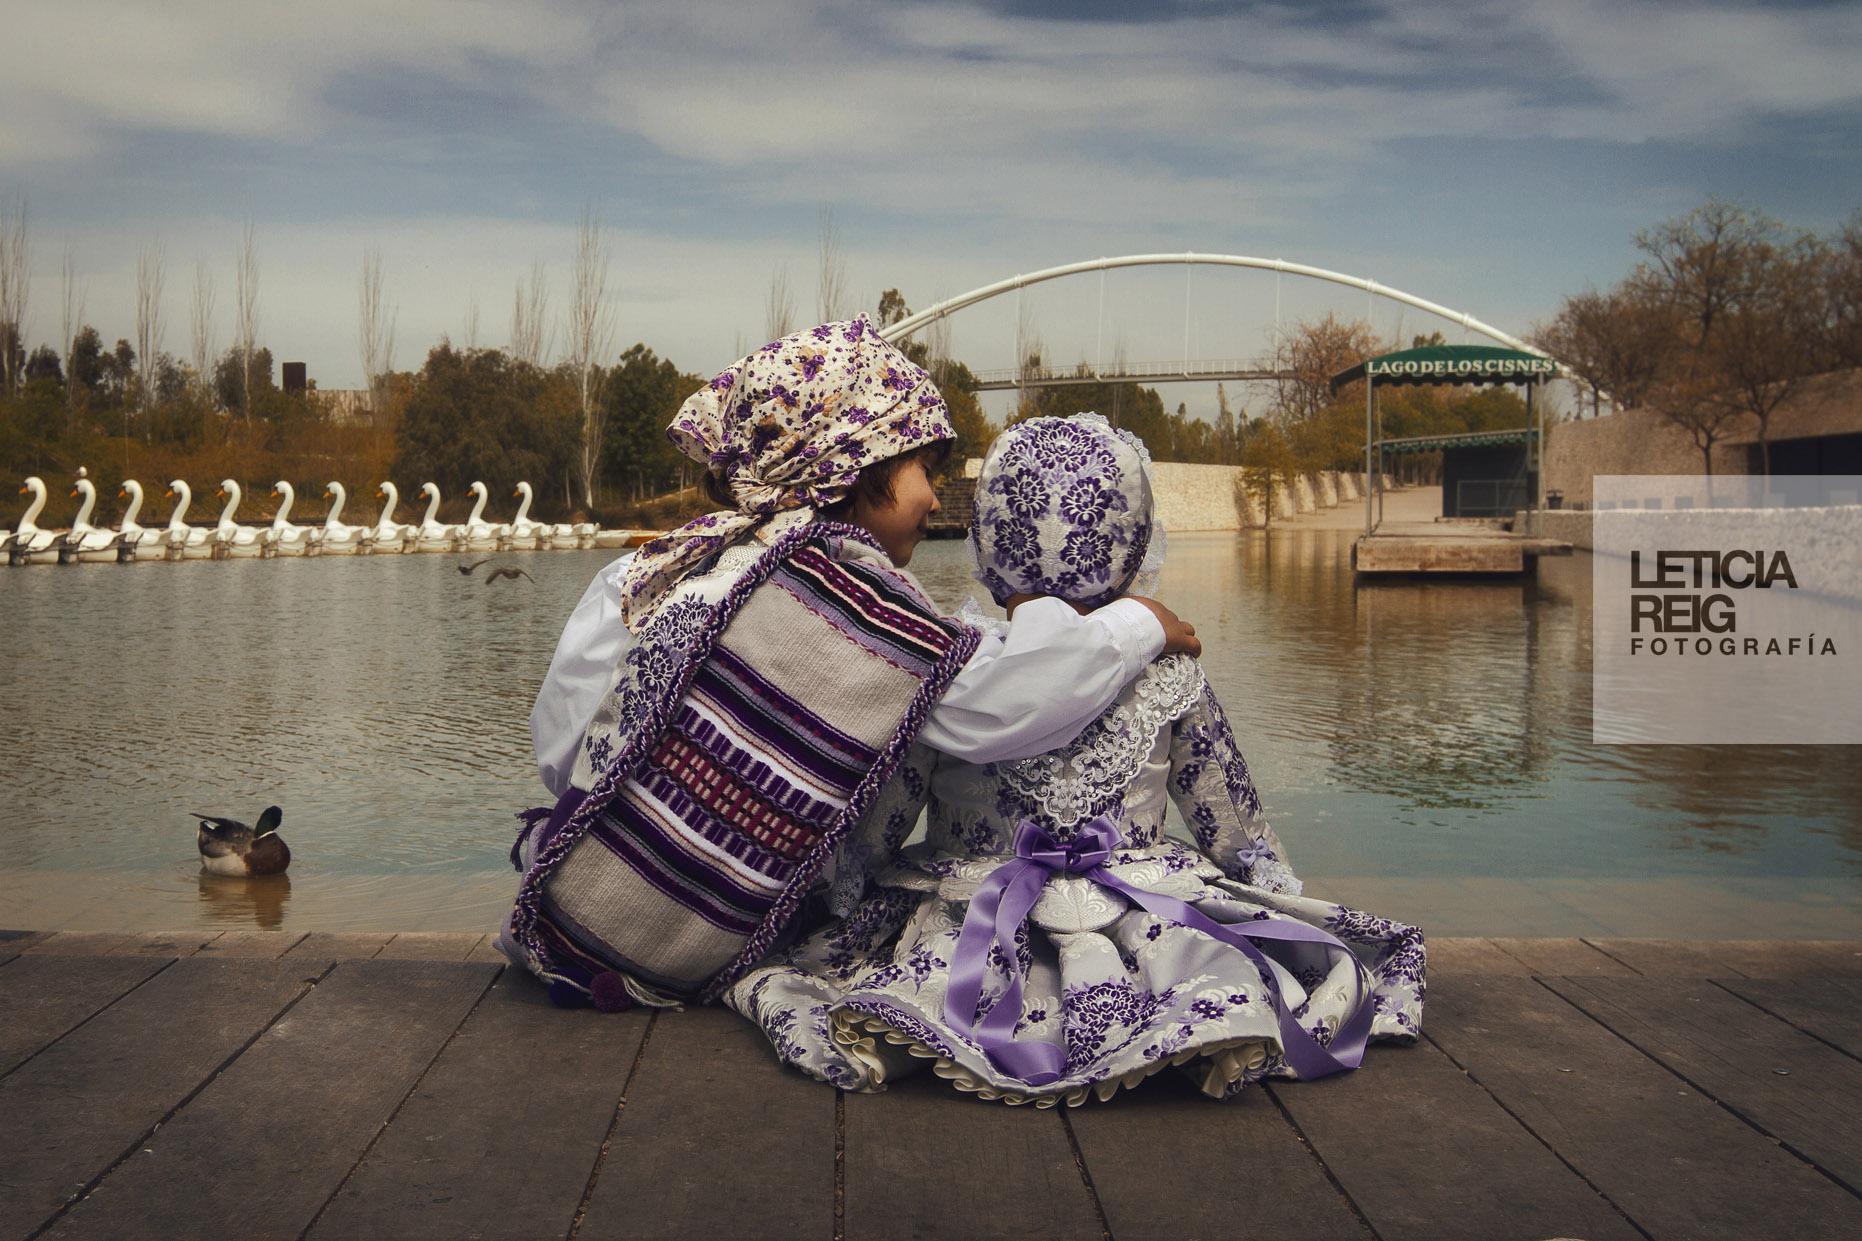 foto-artistica-ninos-valencianos.jpg